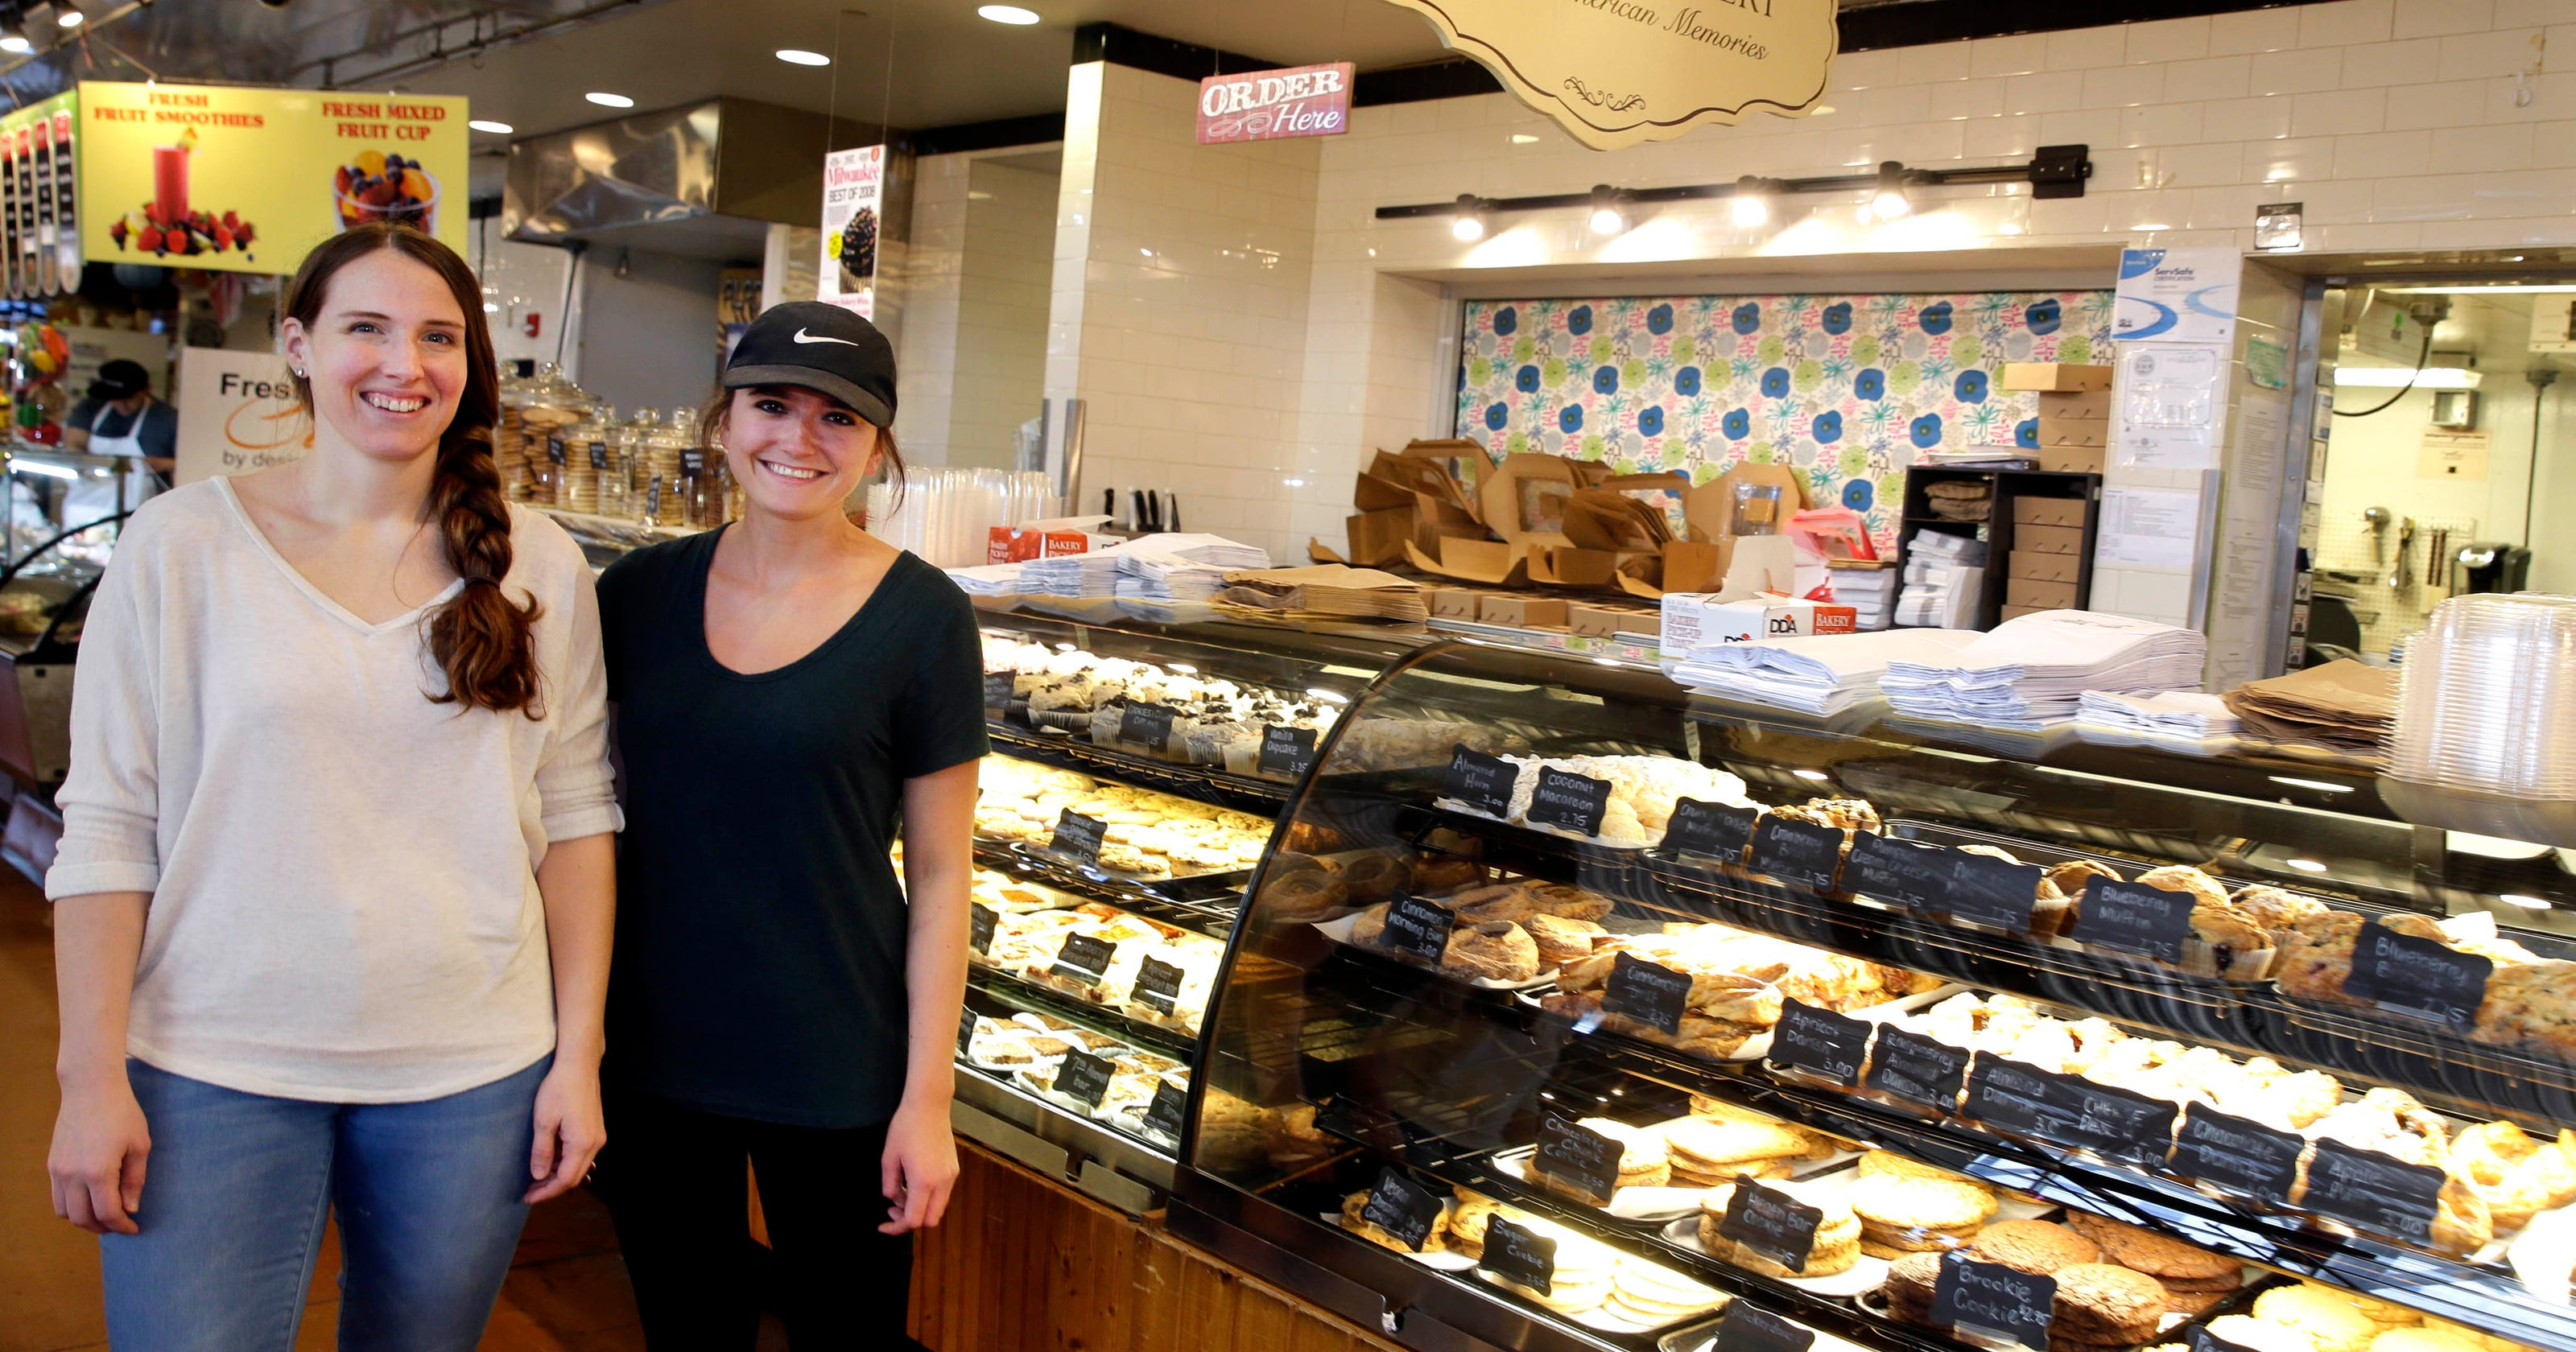 Milwaukee Public Market Does Madison >> C Adam S Bakery In The Milwaukee Public Market Is Changing Hands